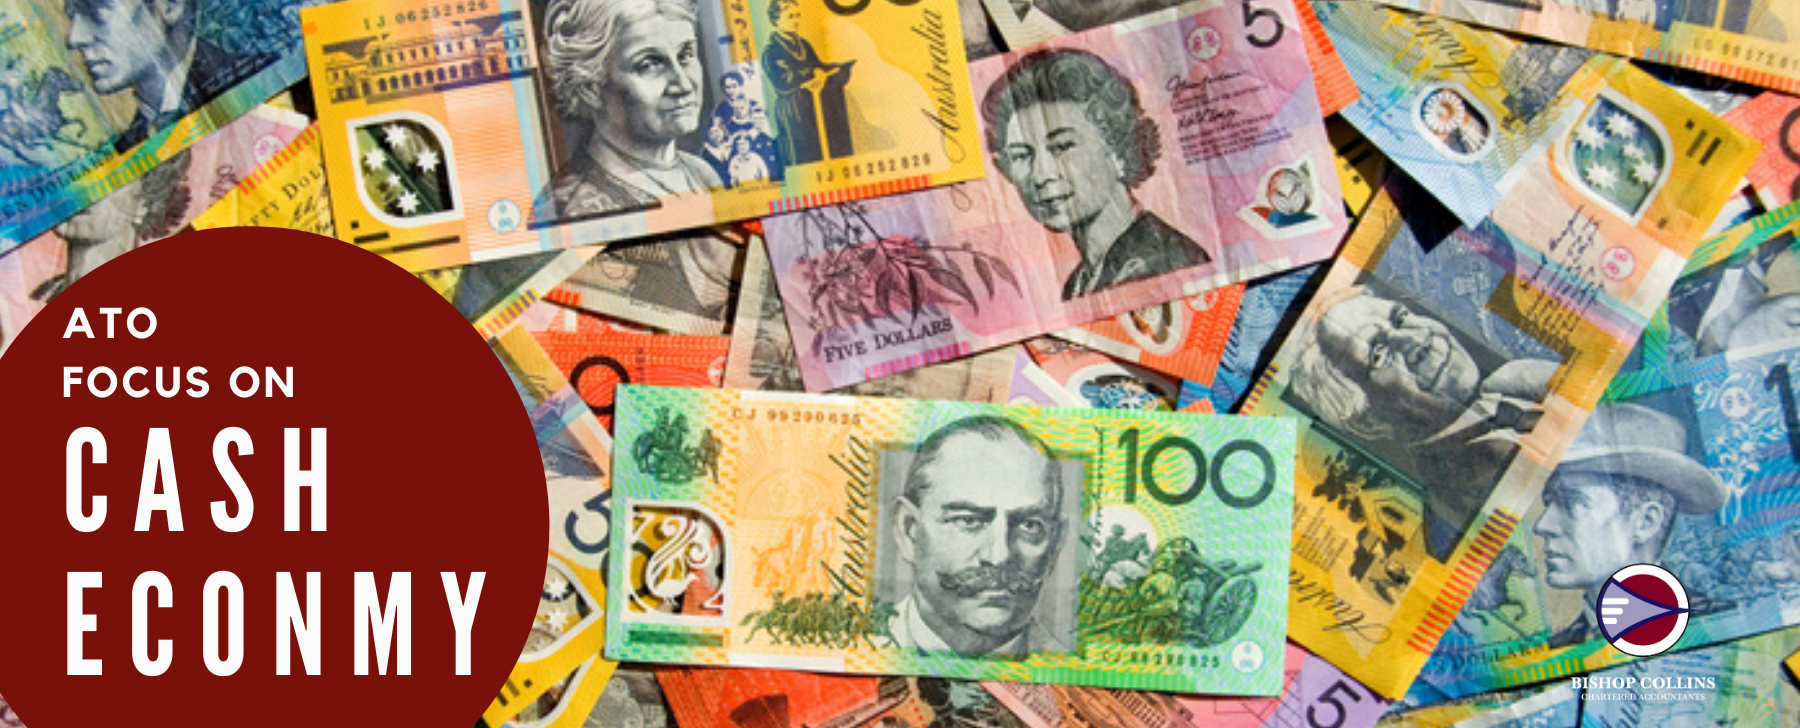 Bishop Collins Accountants focus on cash economy